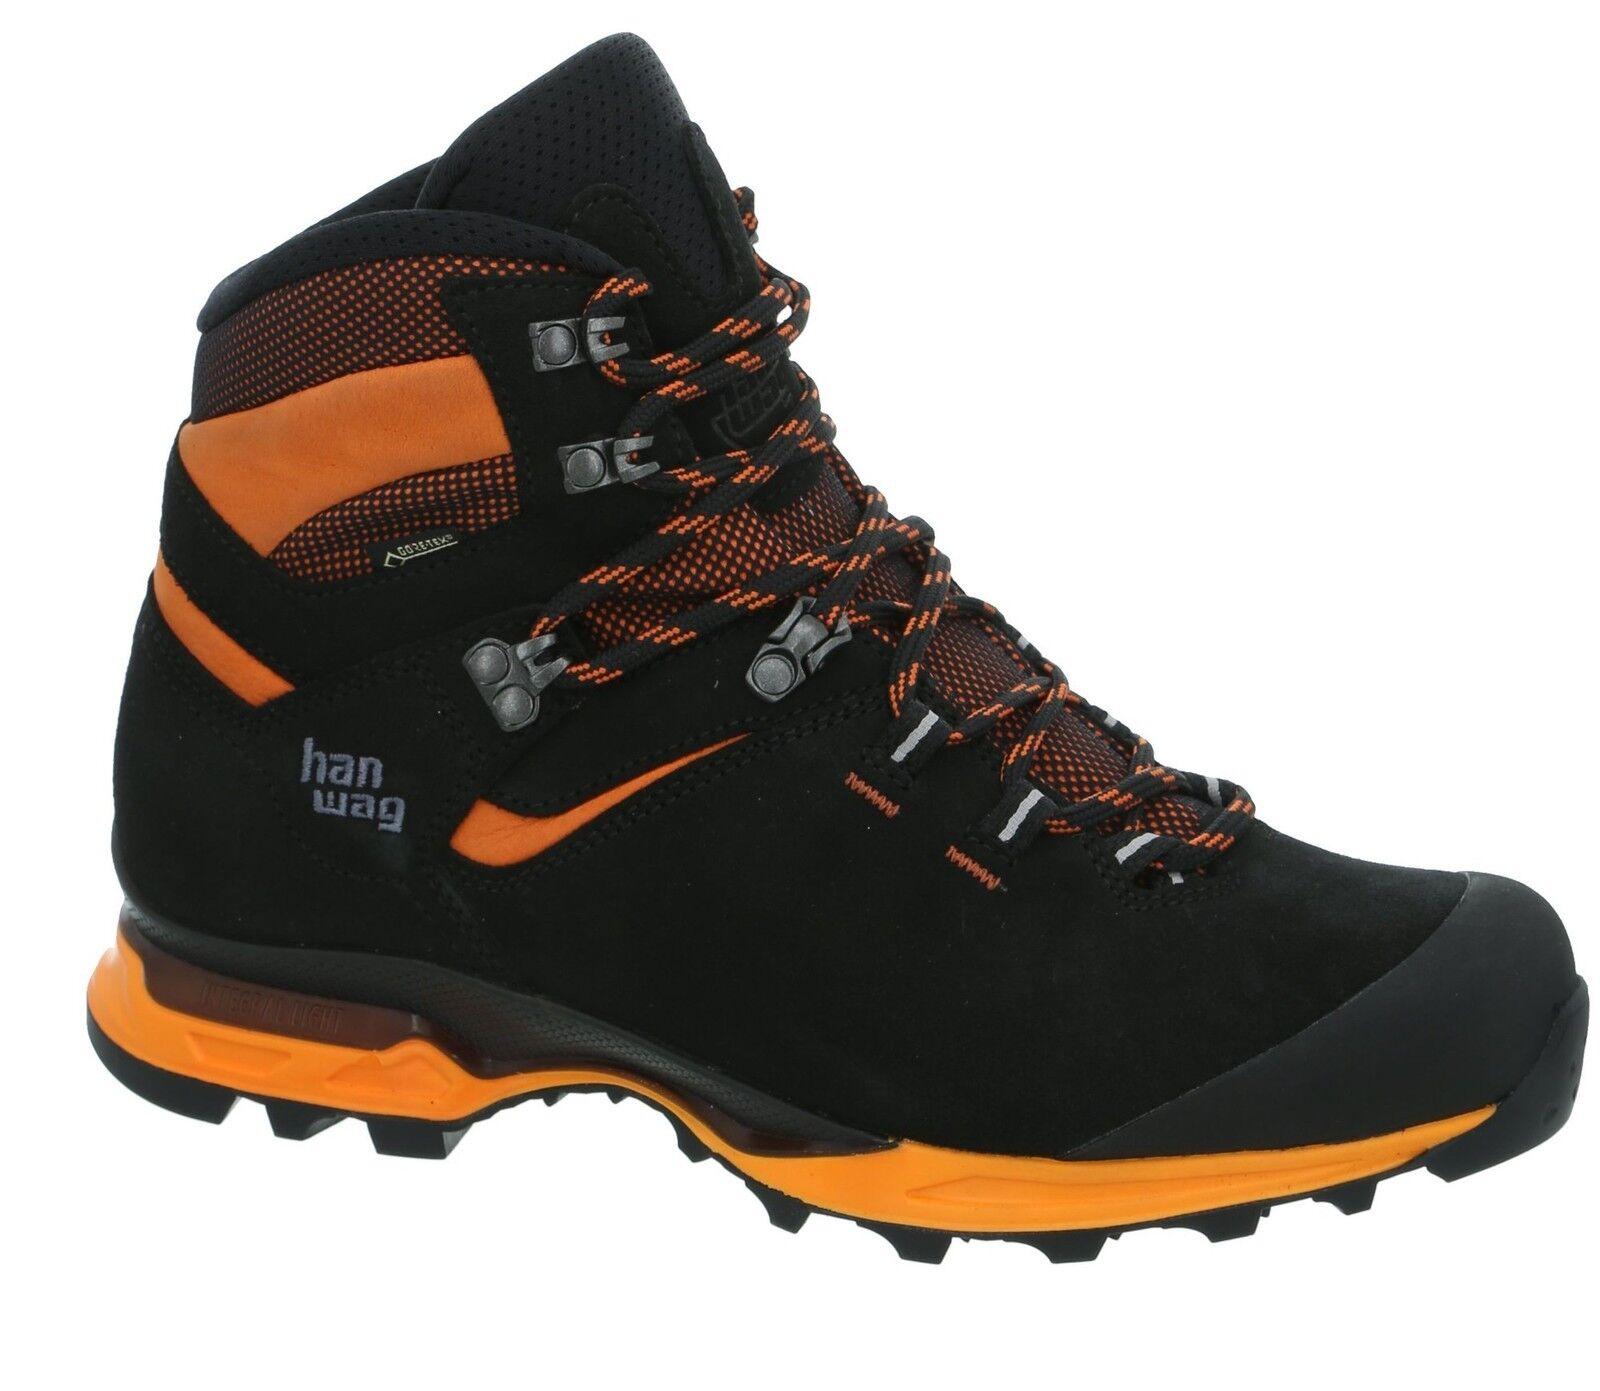 Hanwag montaña zapatos Tatra light GTX talla 10 - 44,5 negro naranja